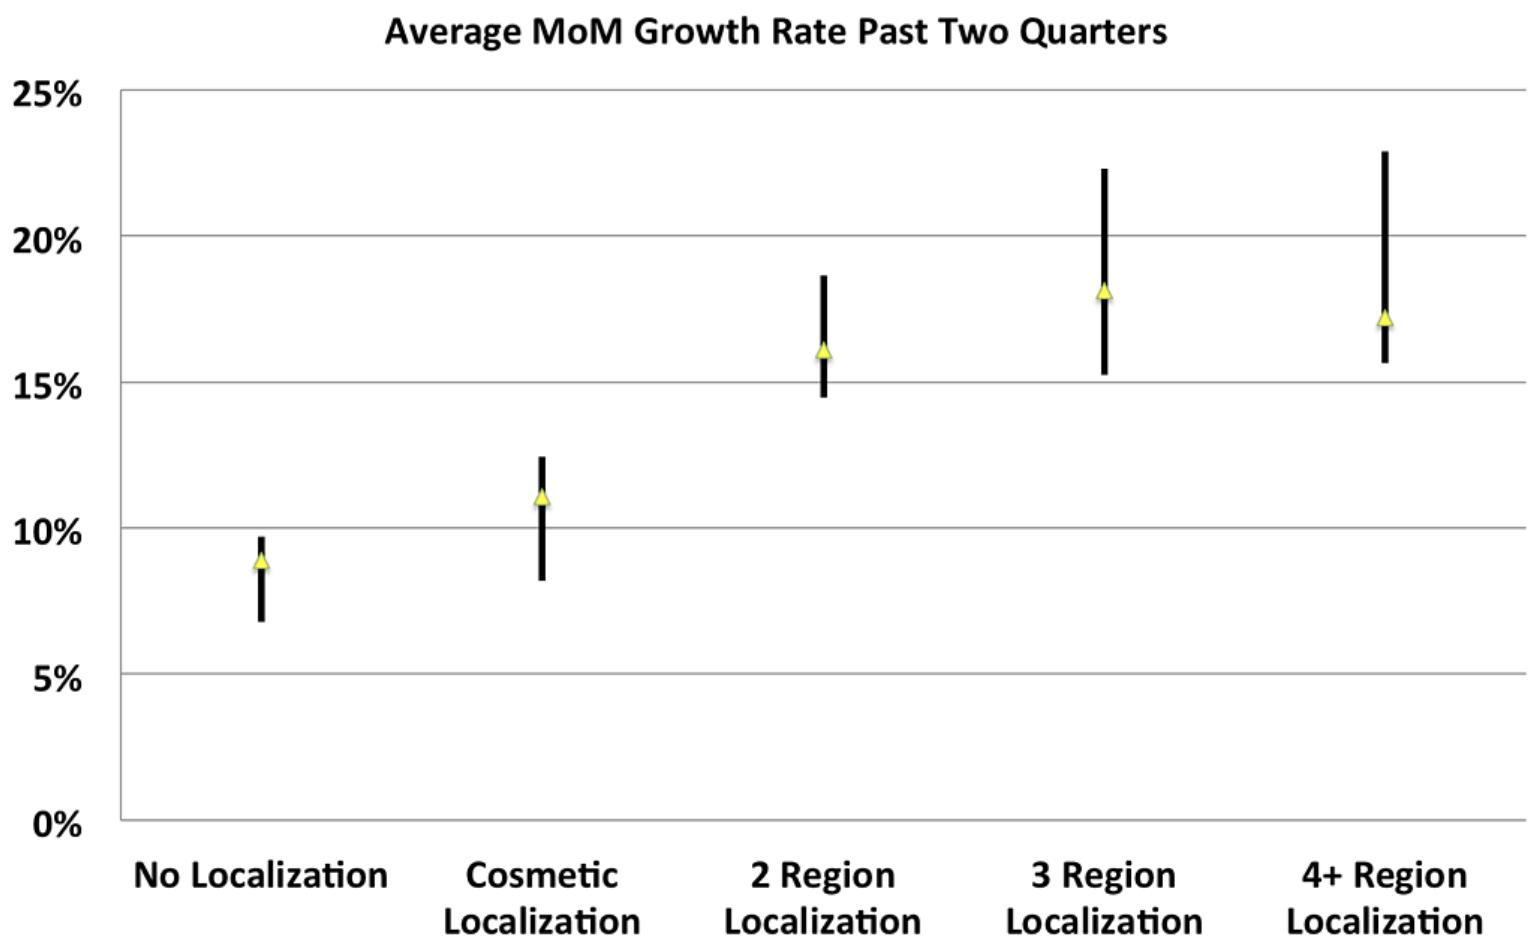 4+ region localization leads to +30% growth